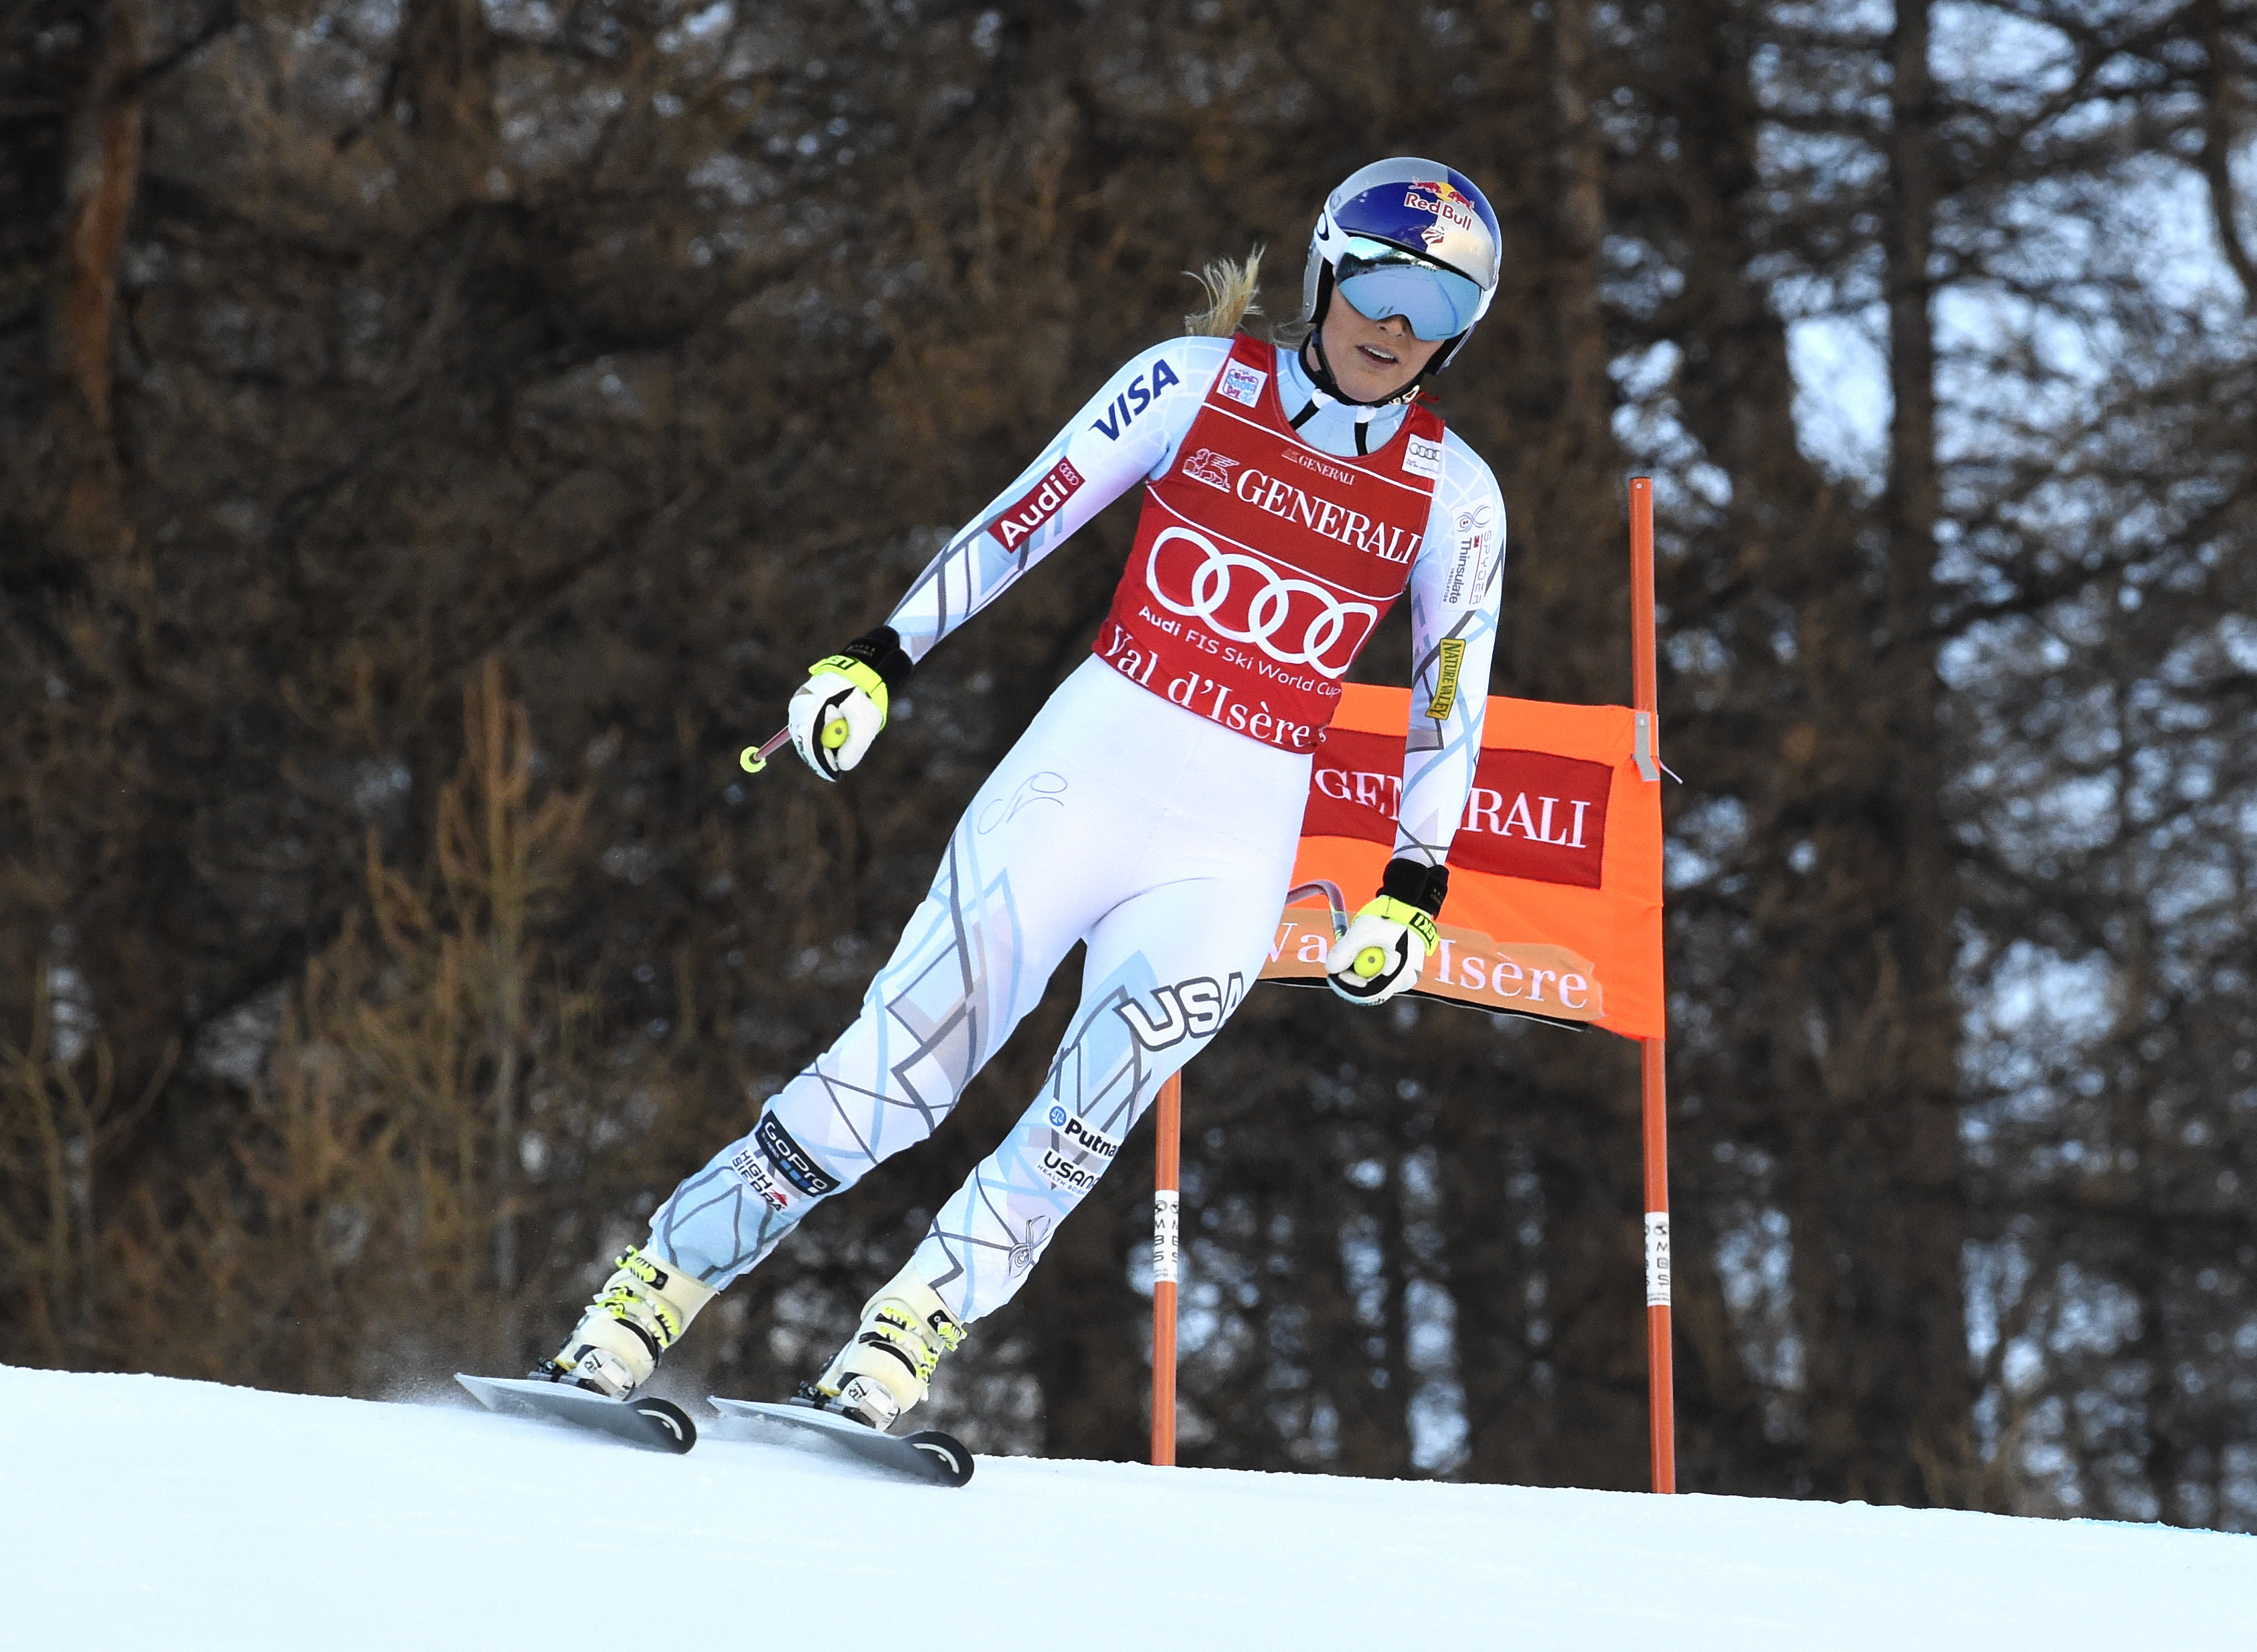 france_alpine_skiing_world_cup1269503104_r894.jpg